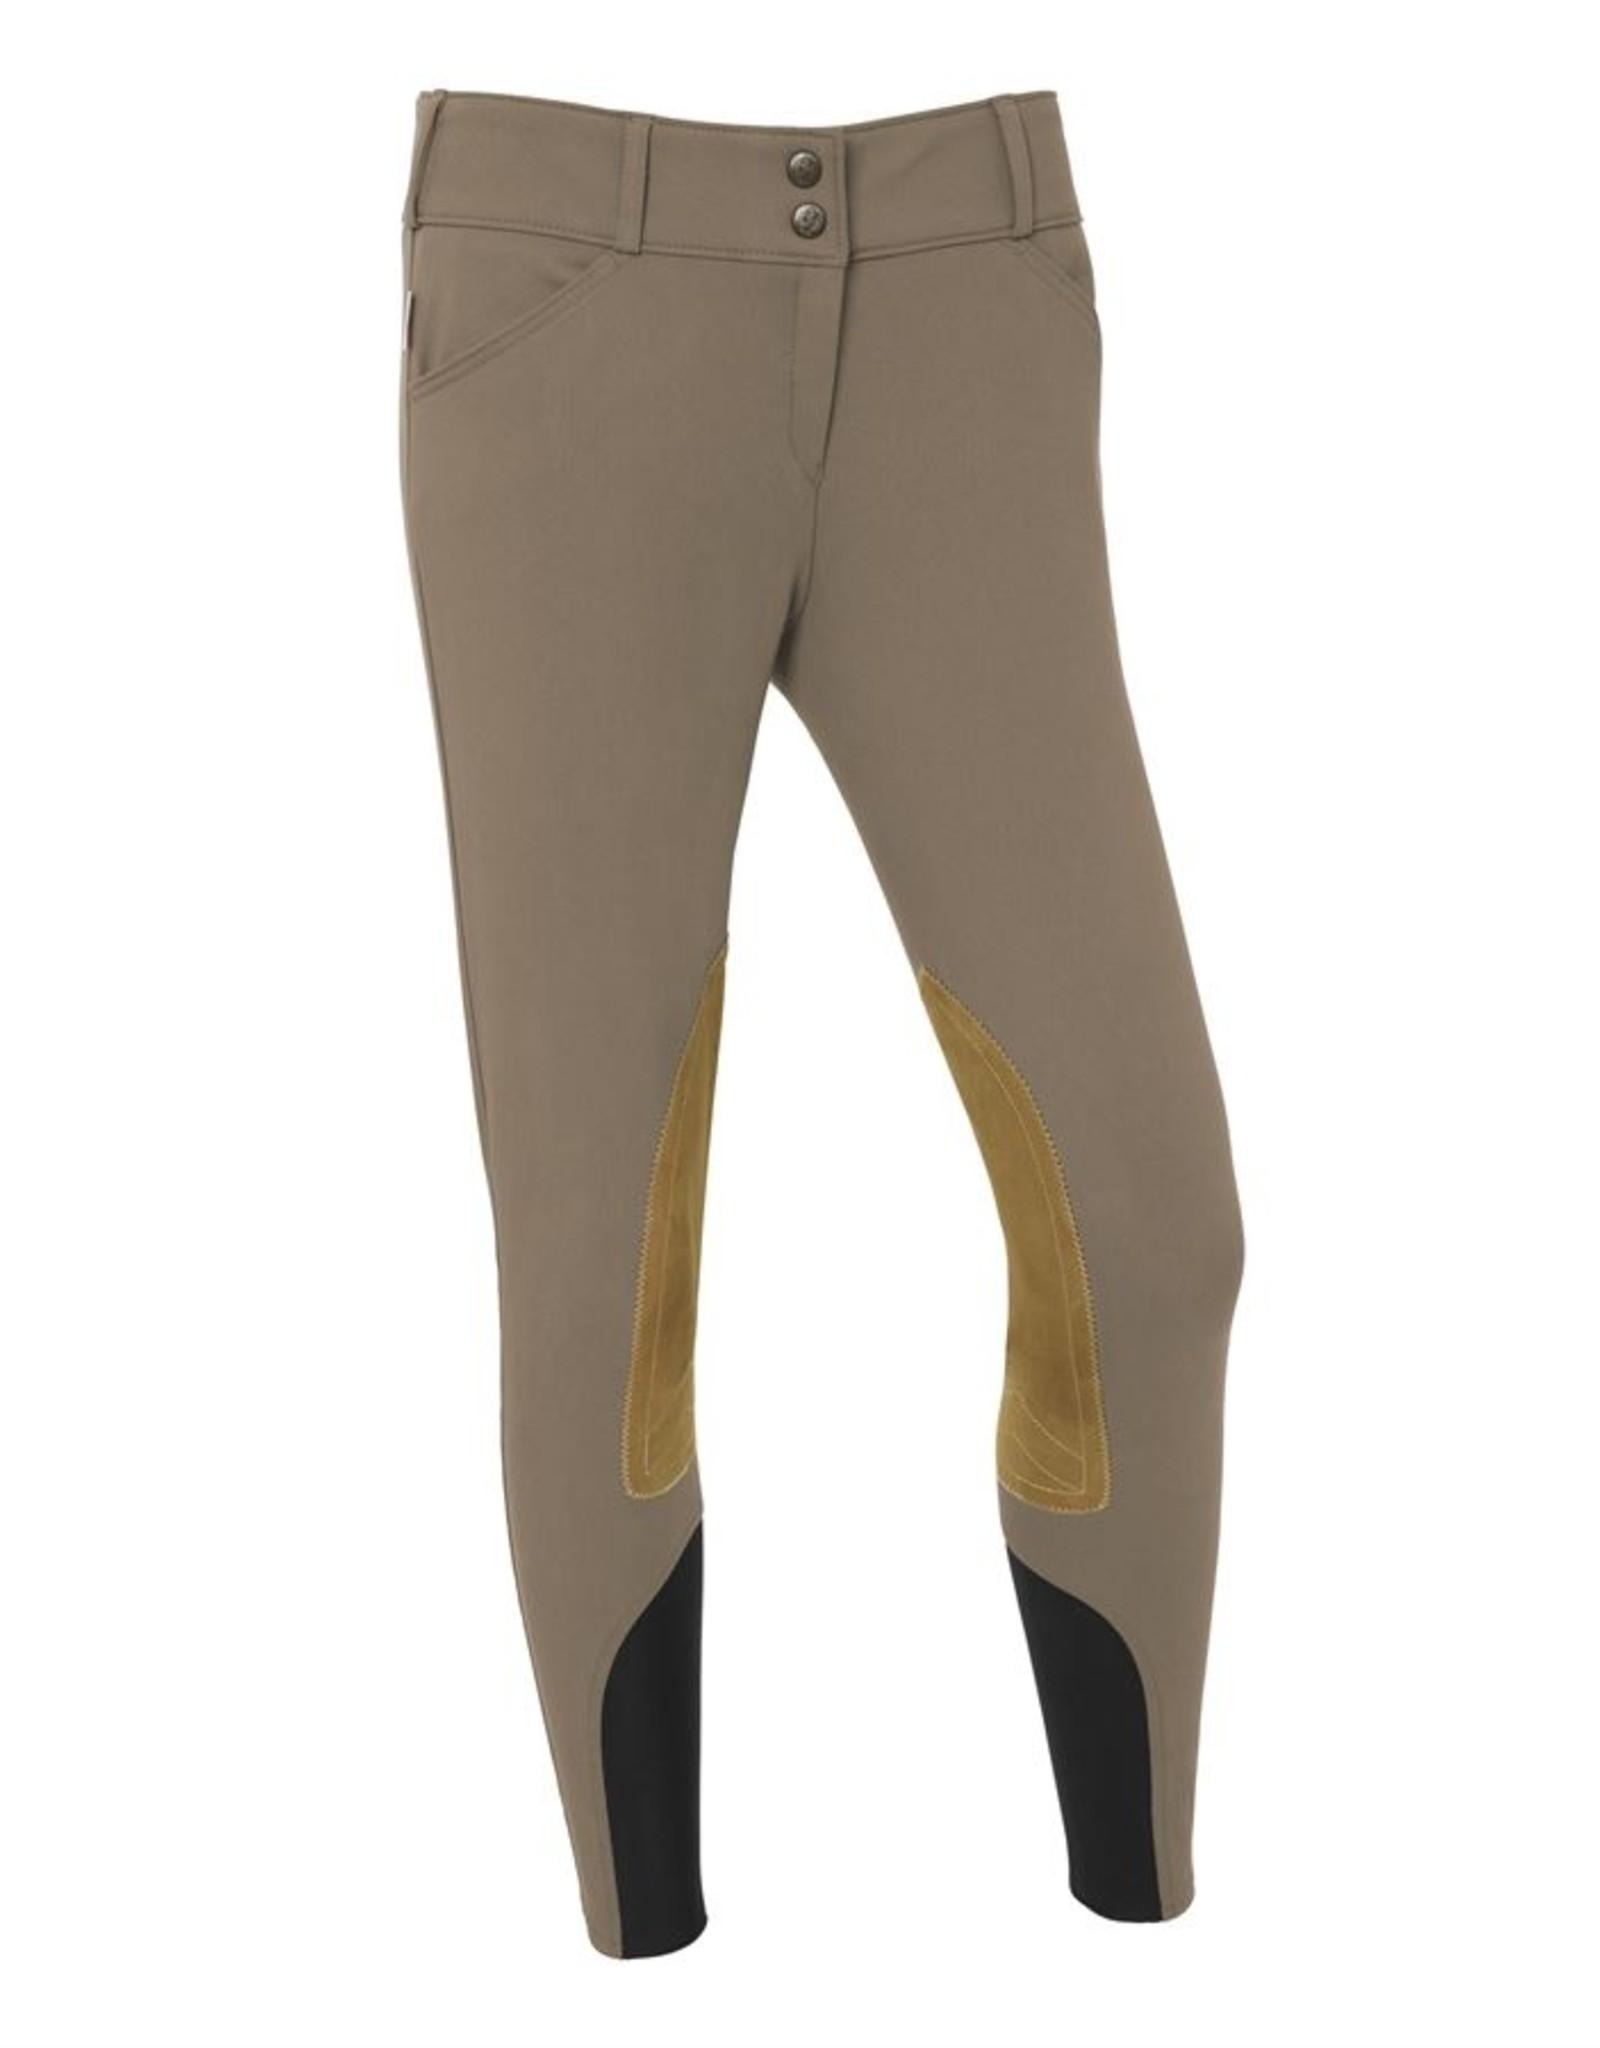 Tailored Sportsman Ladies' Trophy Hunter Mid Rise Sock Bottom Breeches